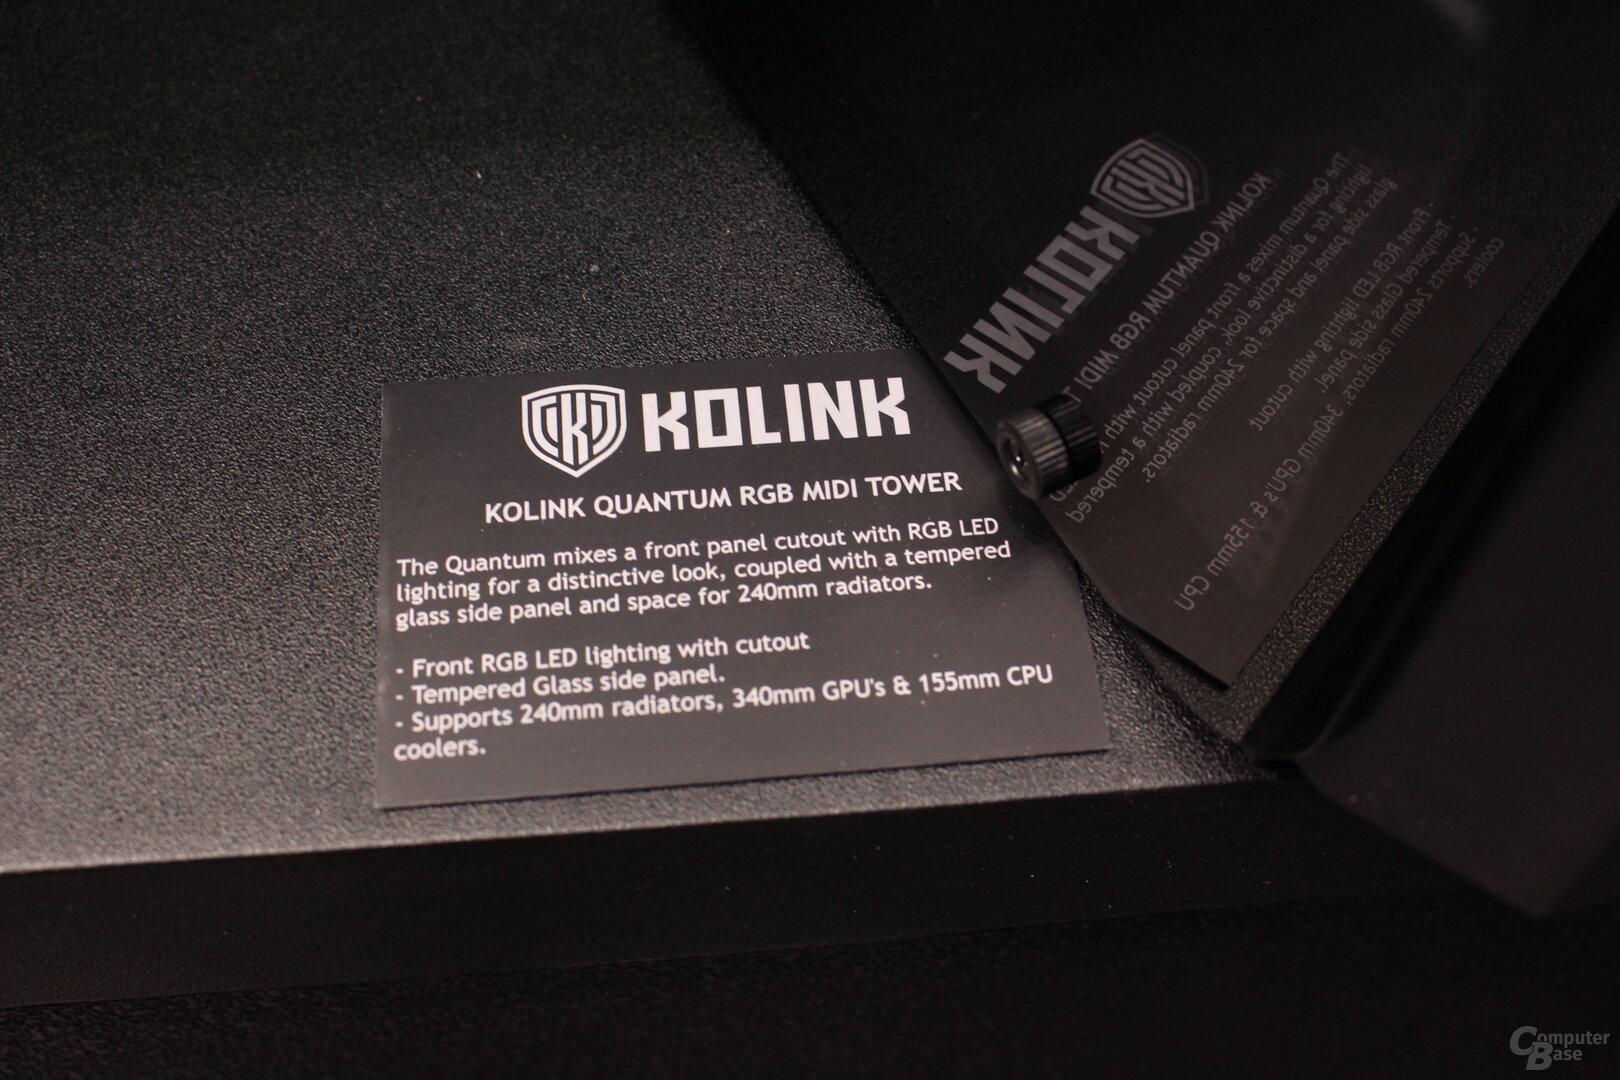 Kolink Quantum RGB